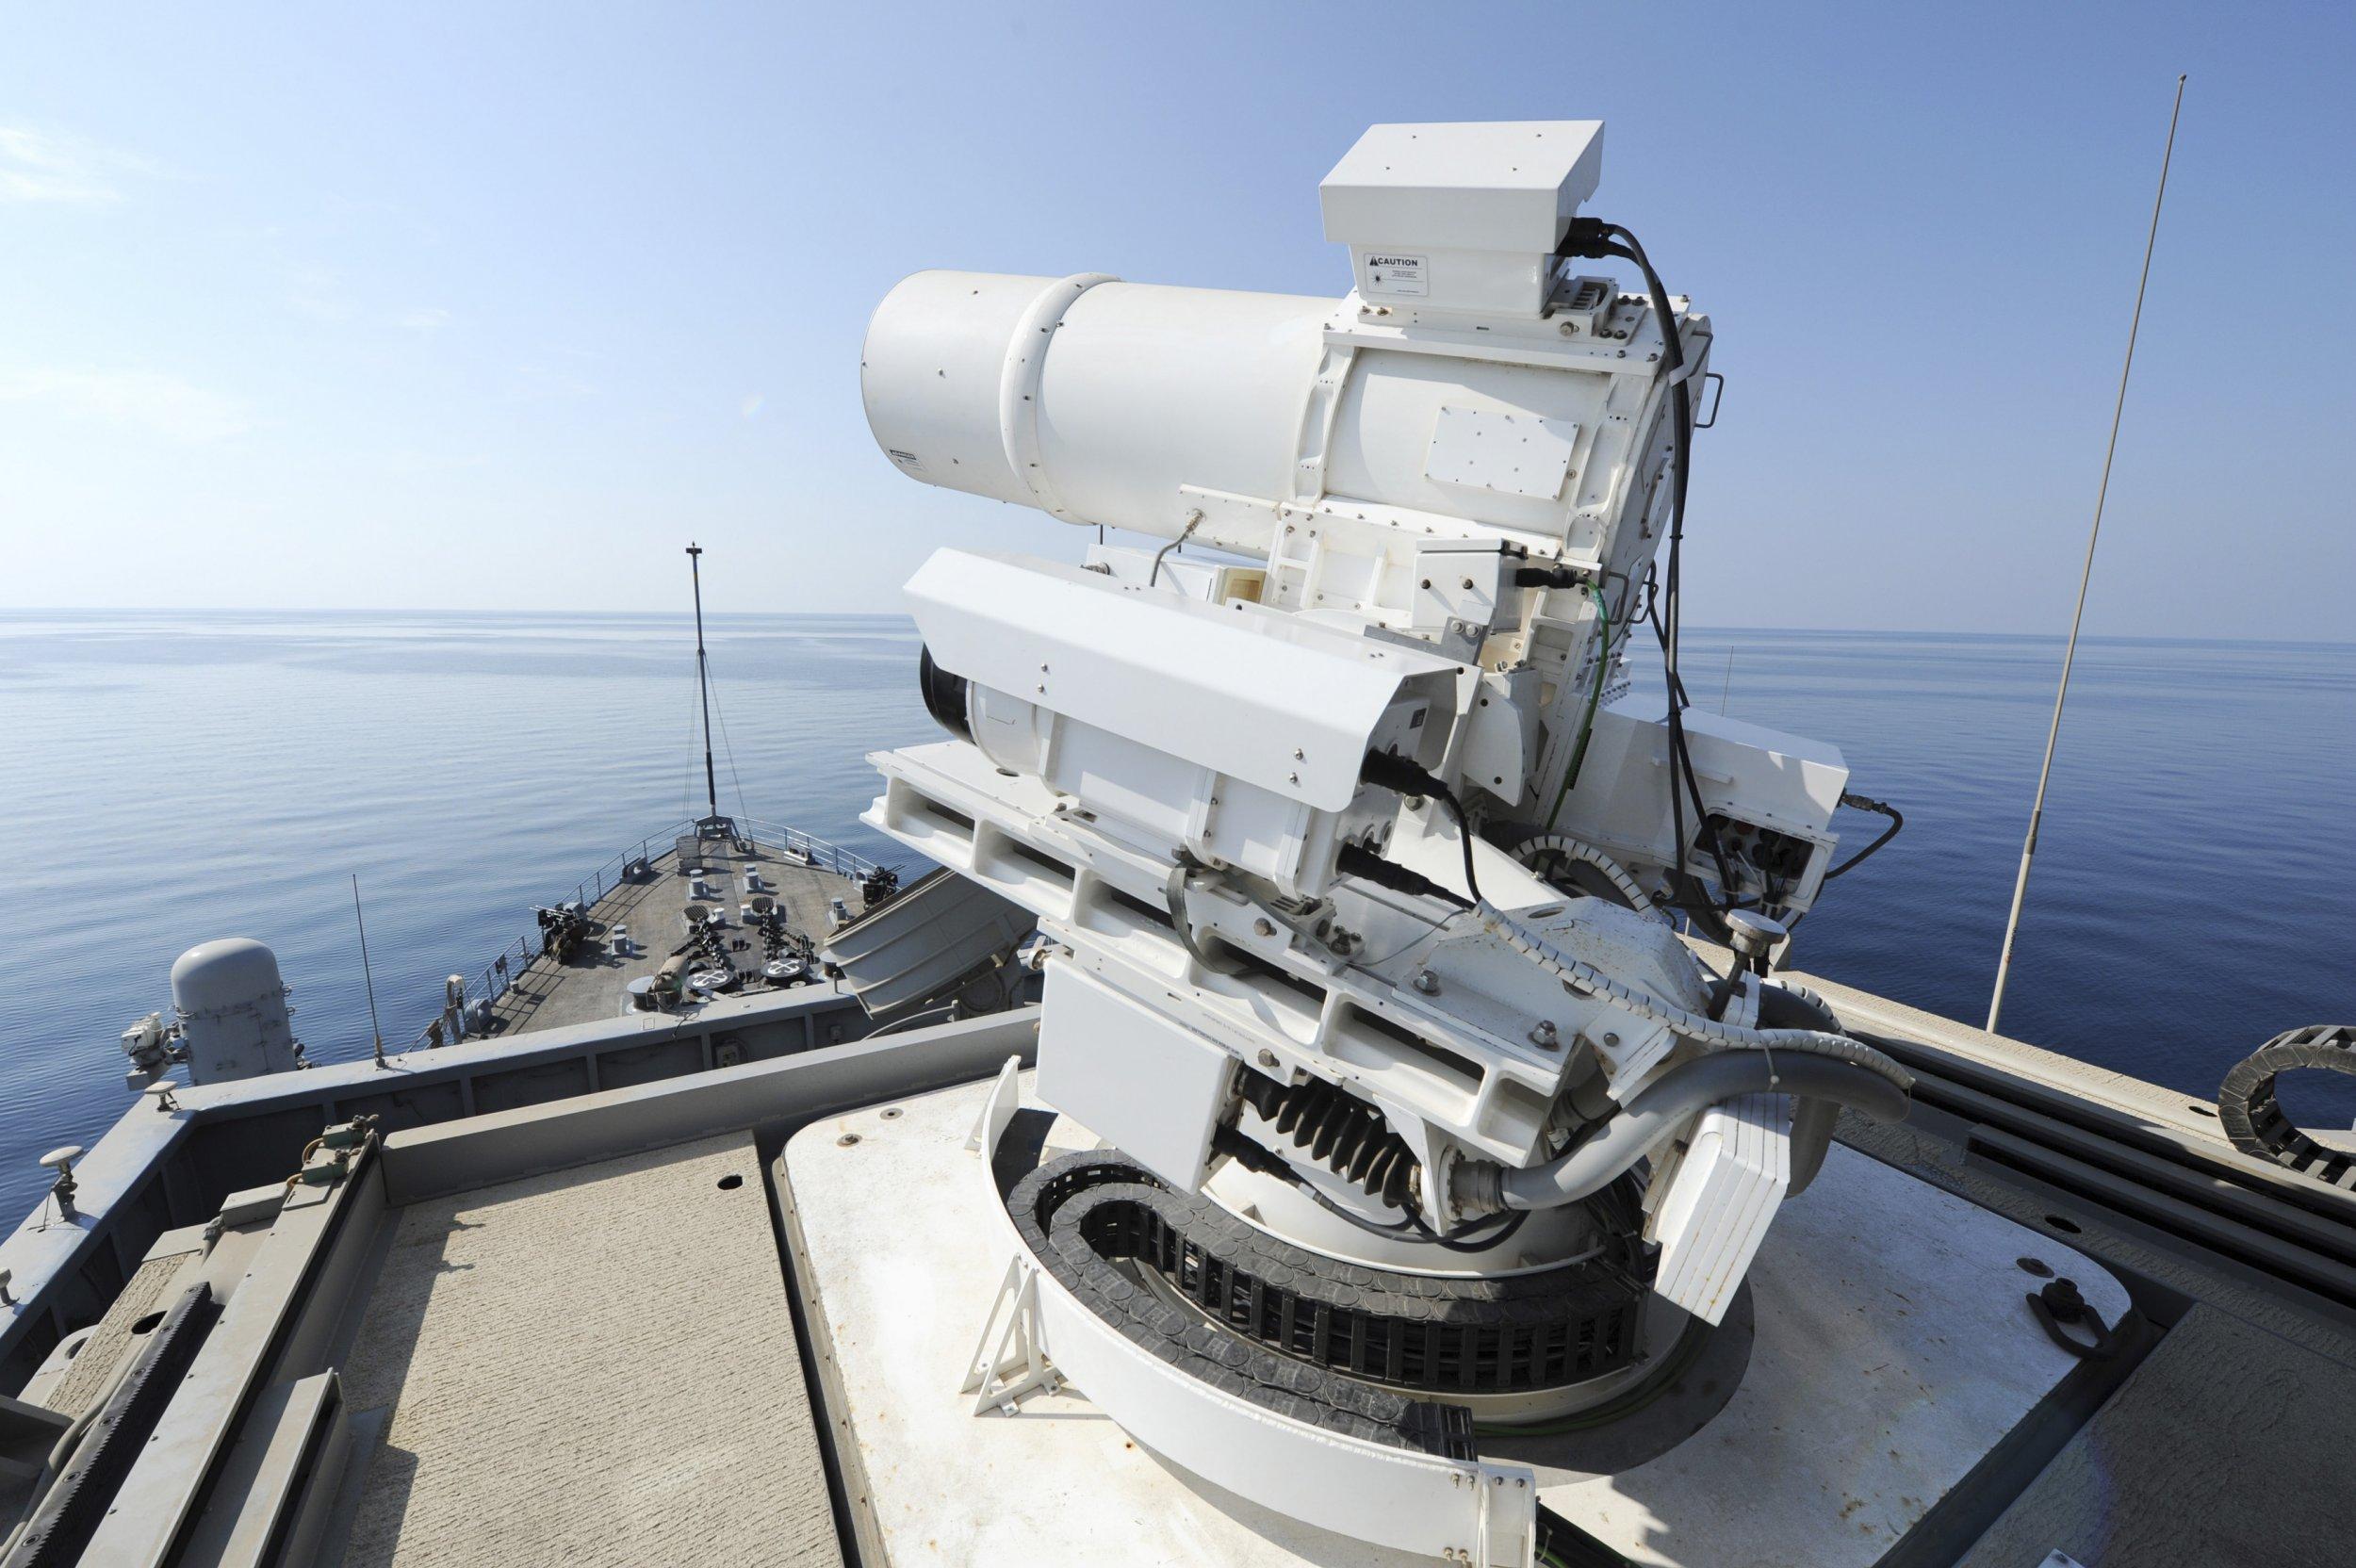 RTR4HMIJ USS Ponce laser system